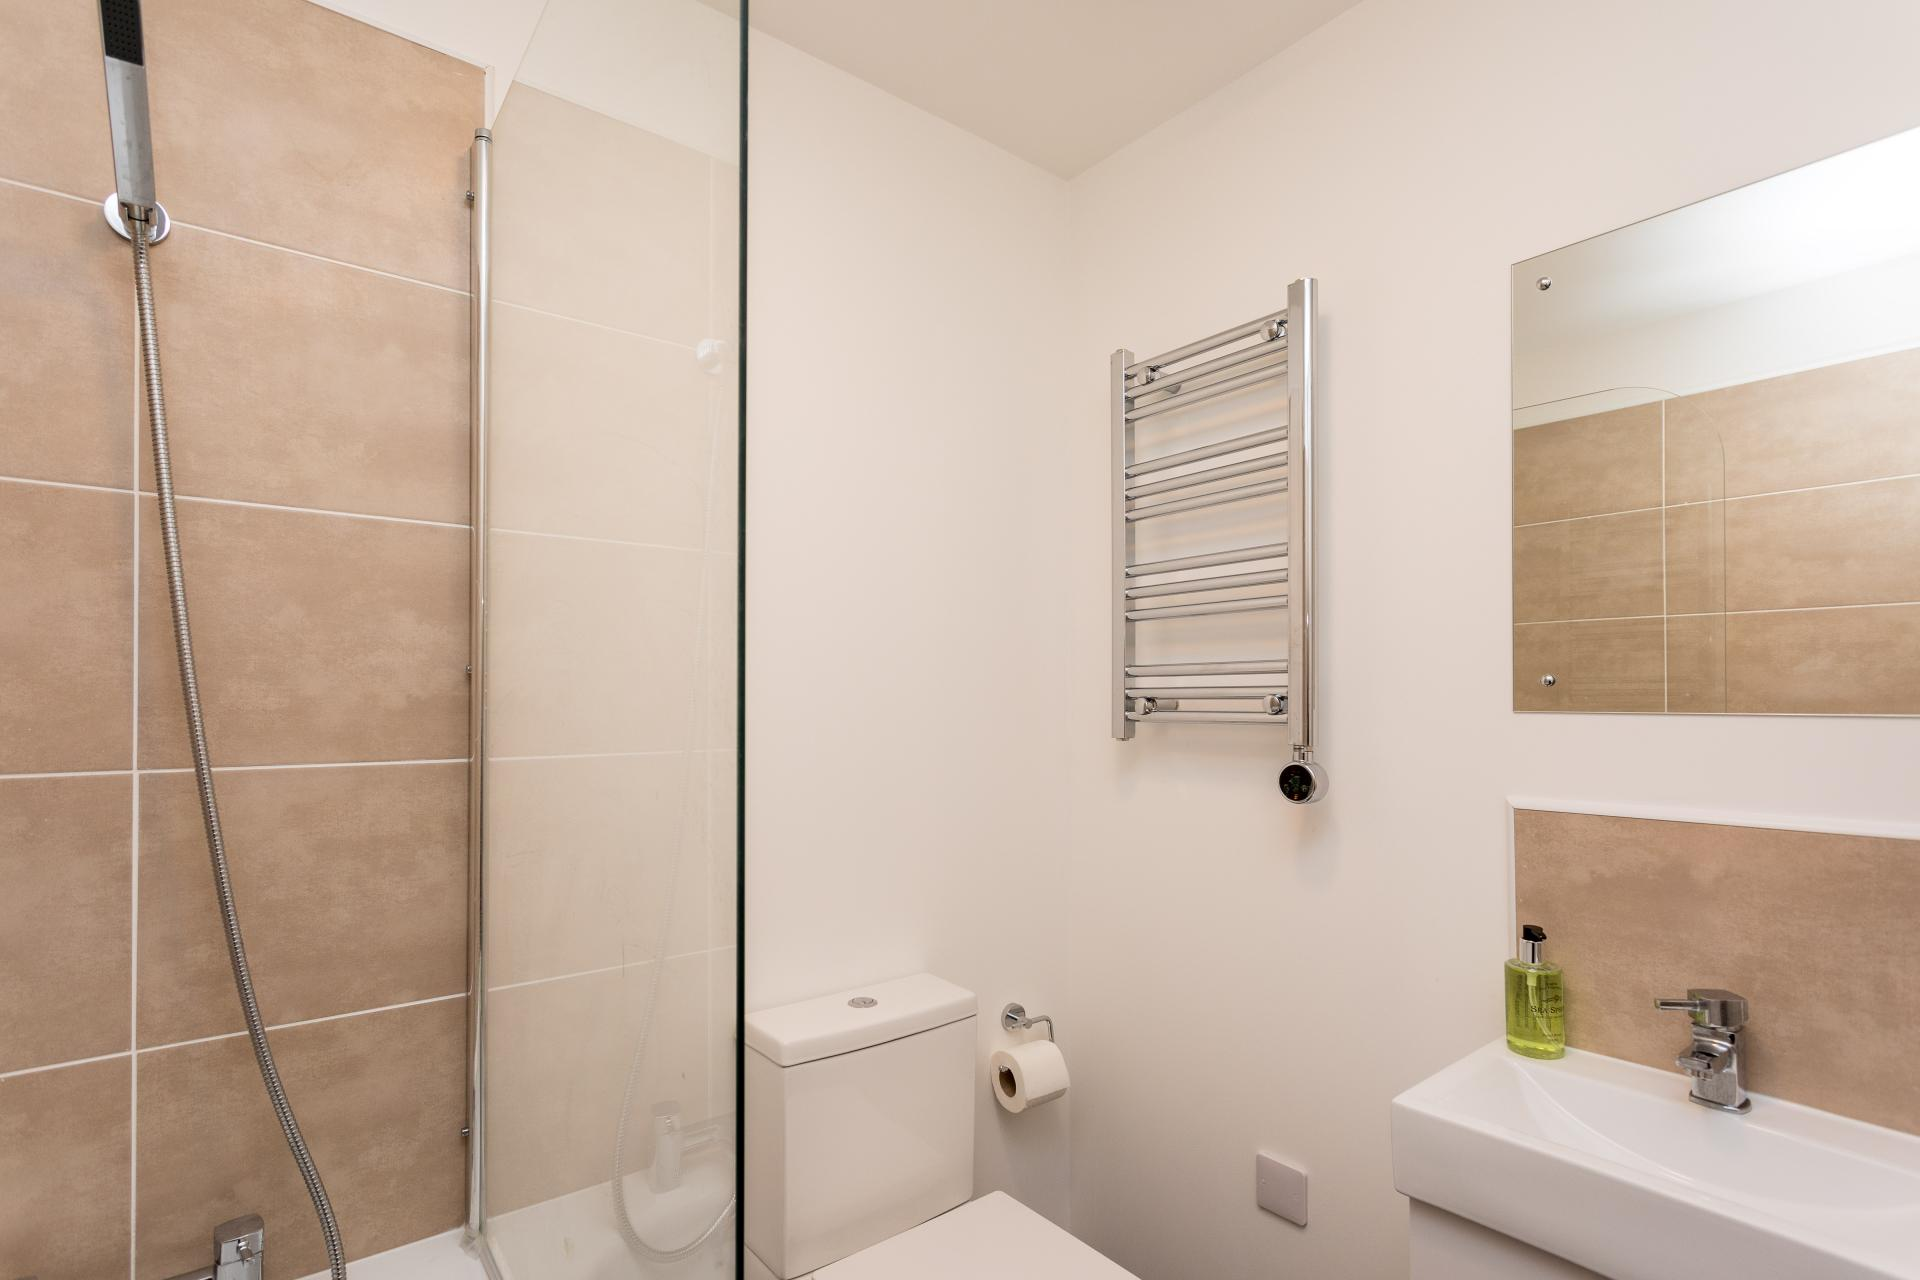 Shower at Sutherland Quarters, Three Bridges, Crawley